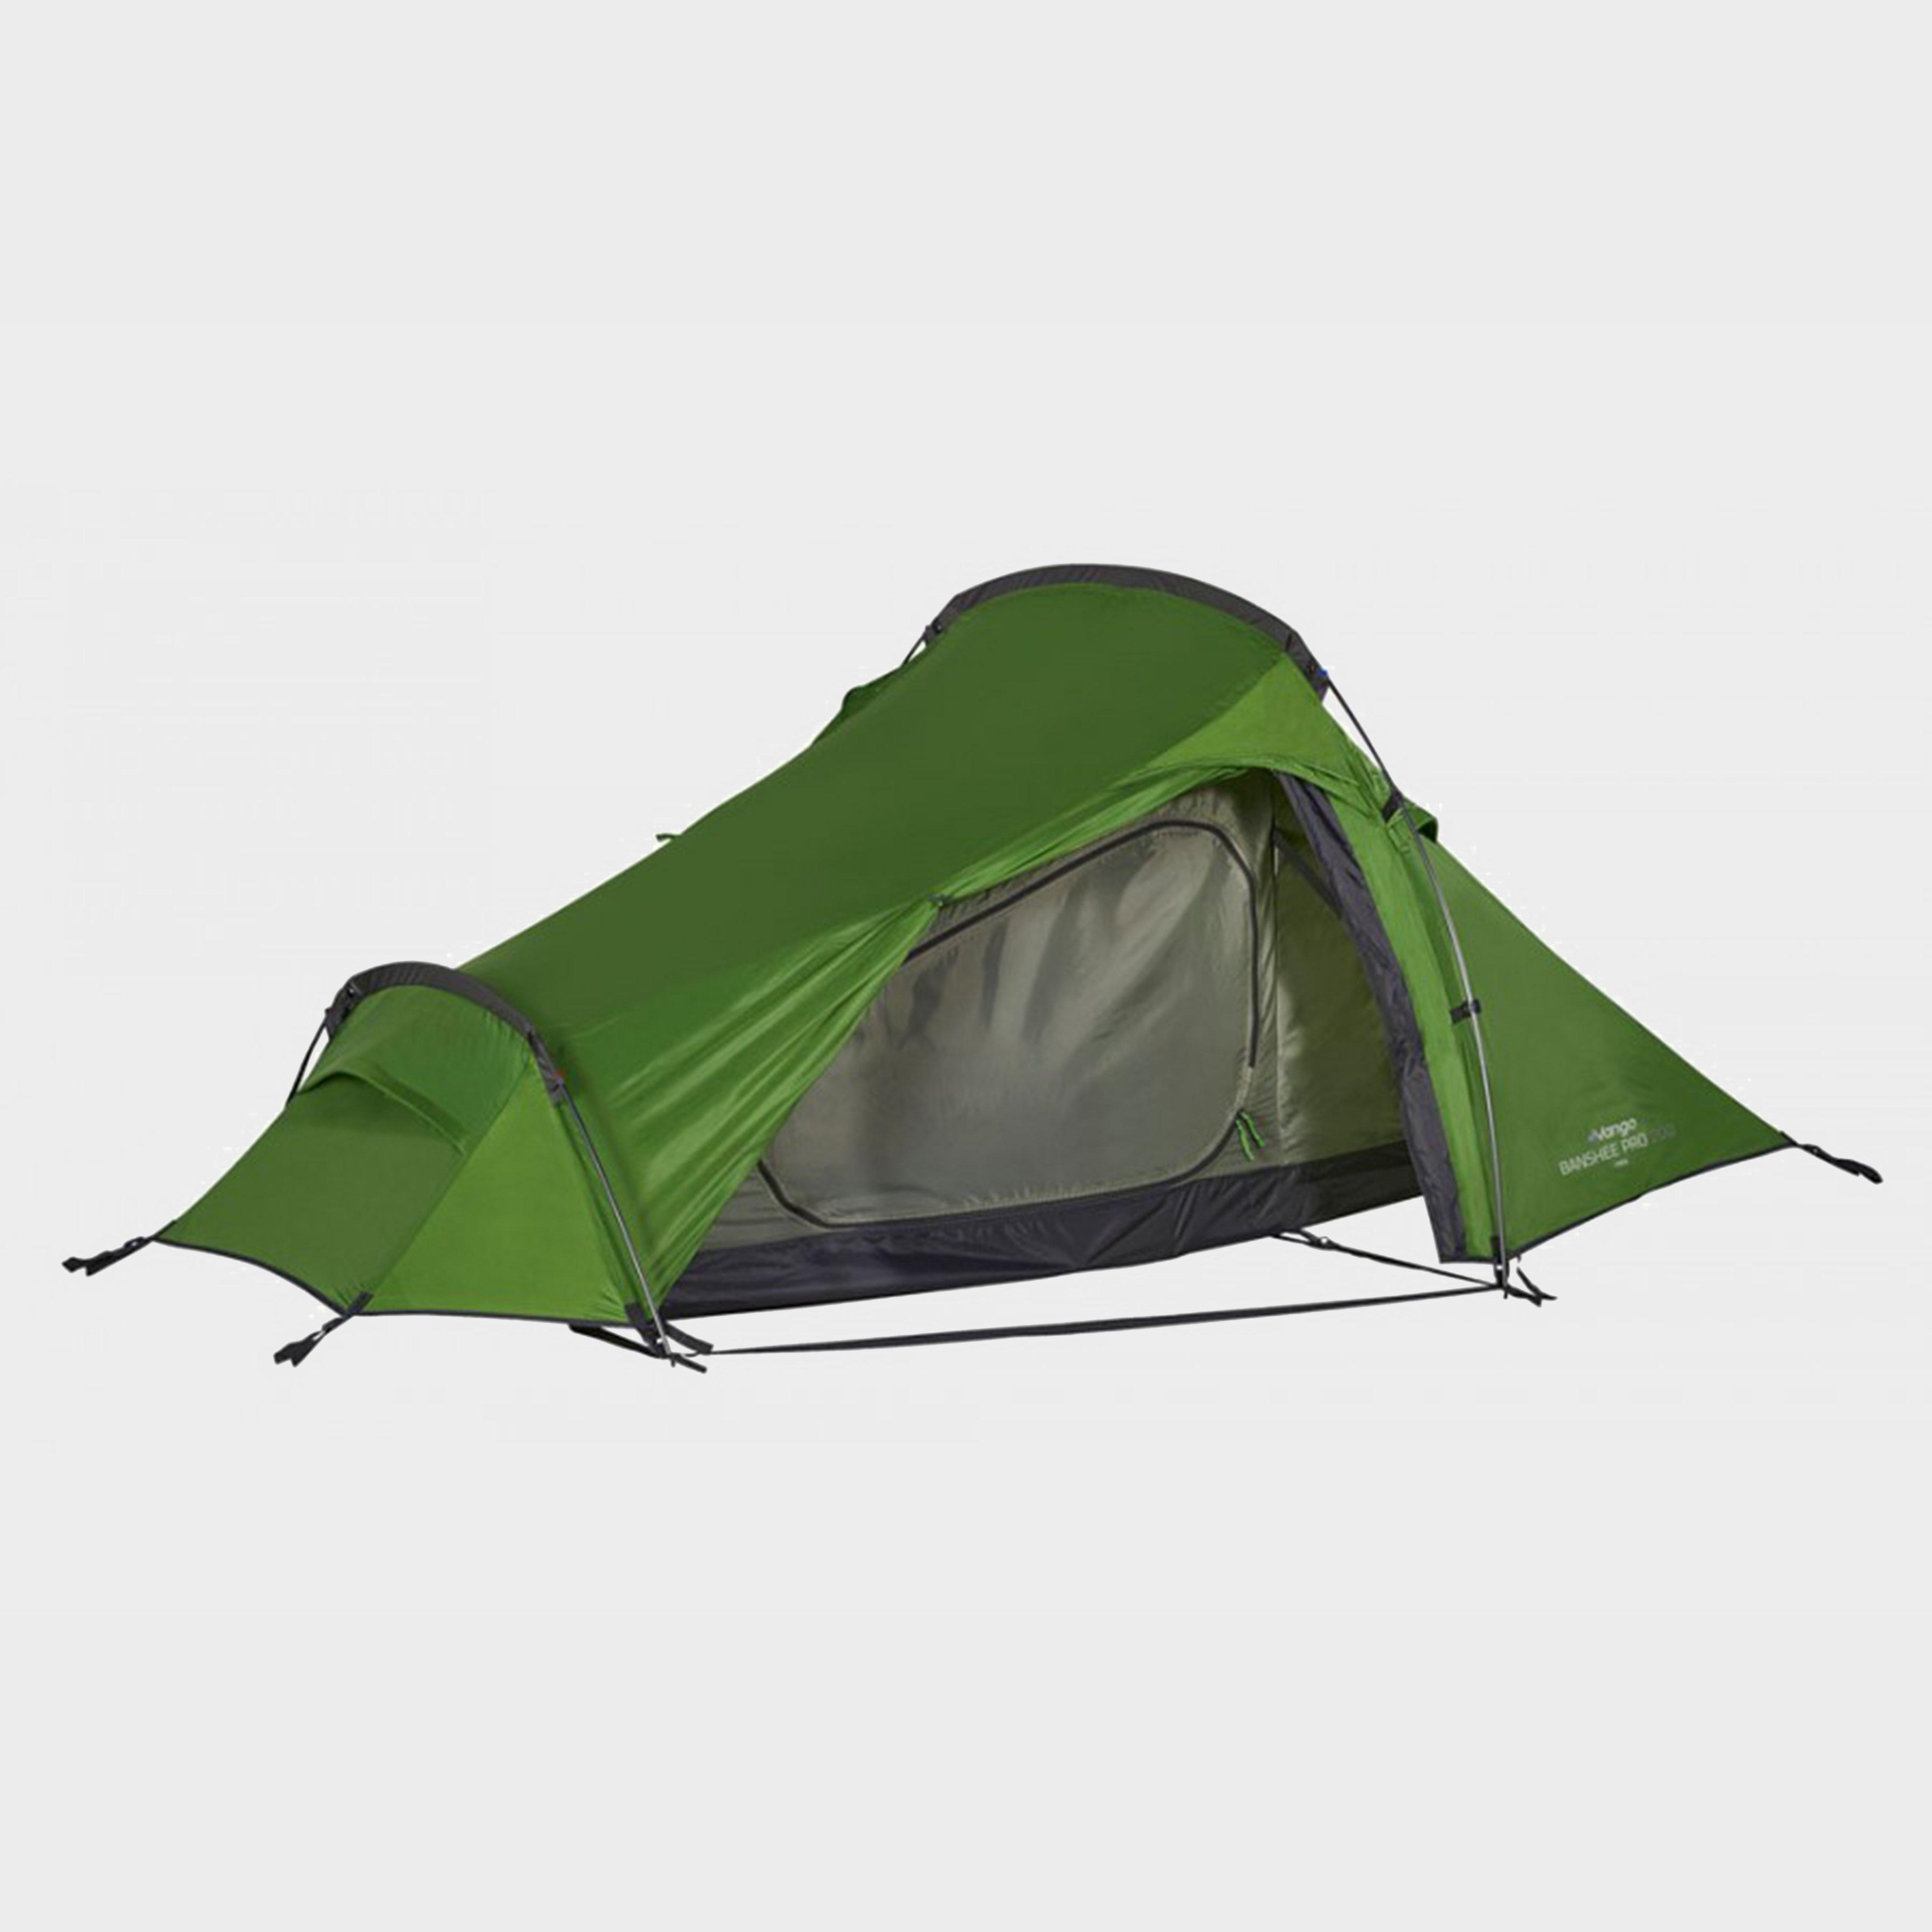 Vango Vango Banshee 200 Pro Backpacking Tent - Green, Green